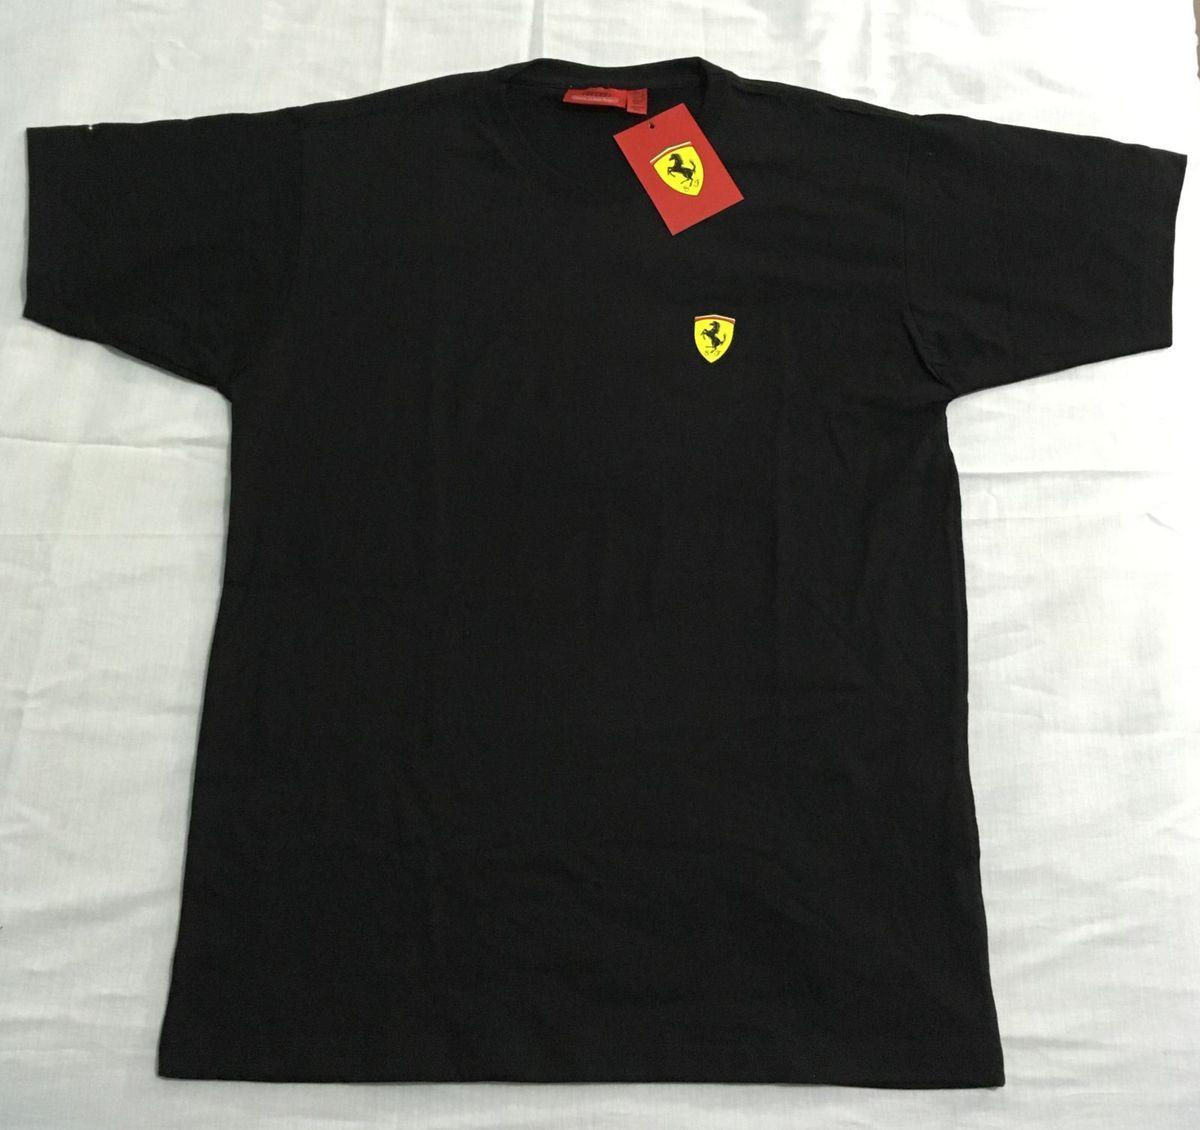 1f0ddb1402 camiseta ferrari - camisetas ferrari.  Czm6ly9wag90b3muzw5qb2vplmnvbs5ici9wcm9kdwn0cy83odc0mdm3l2qyywm0mzzlodlinmrkmmy2ogq2zdmxm2rjnwi3mjzklmpwzw